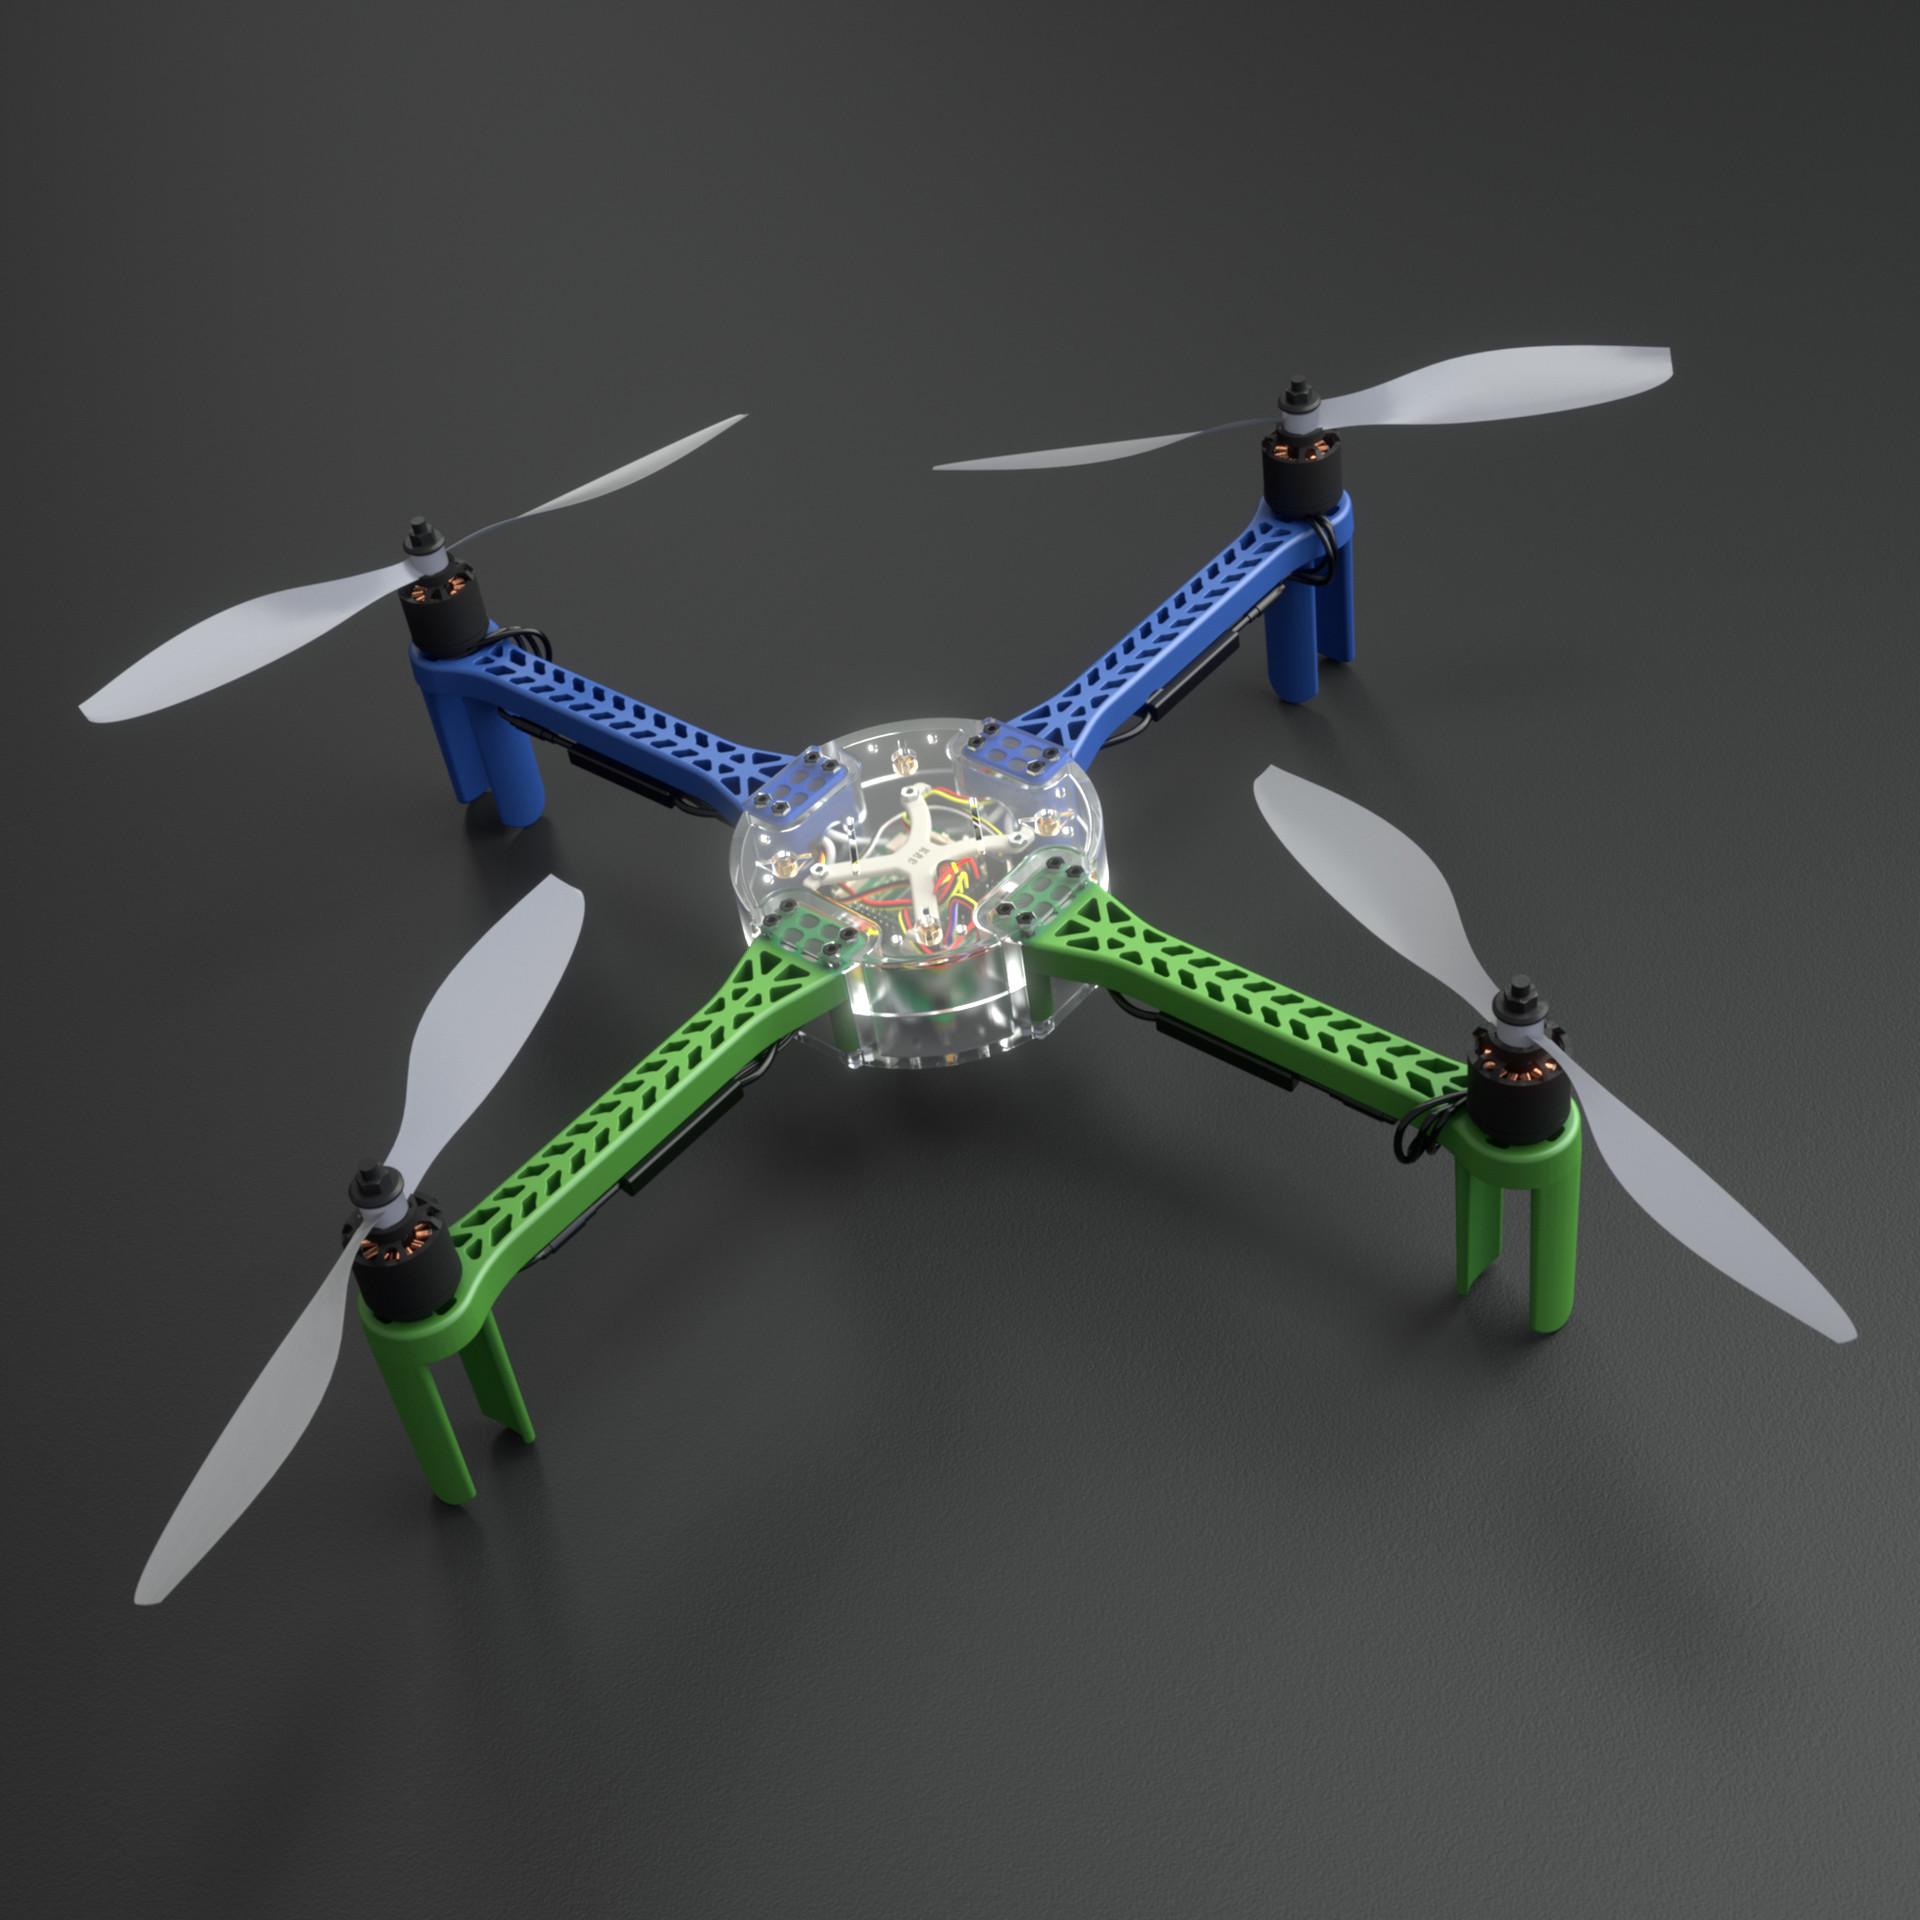 James mauger full drone base 2k